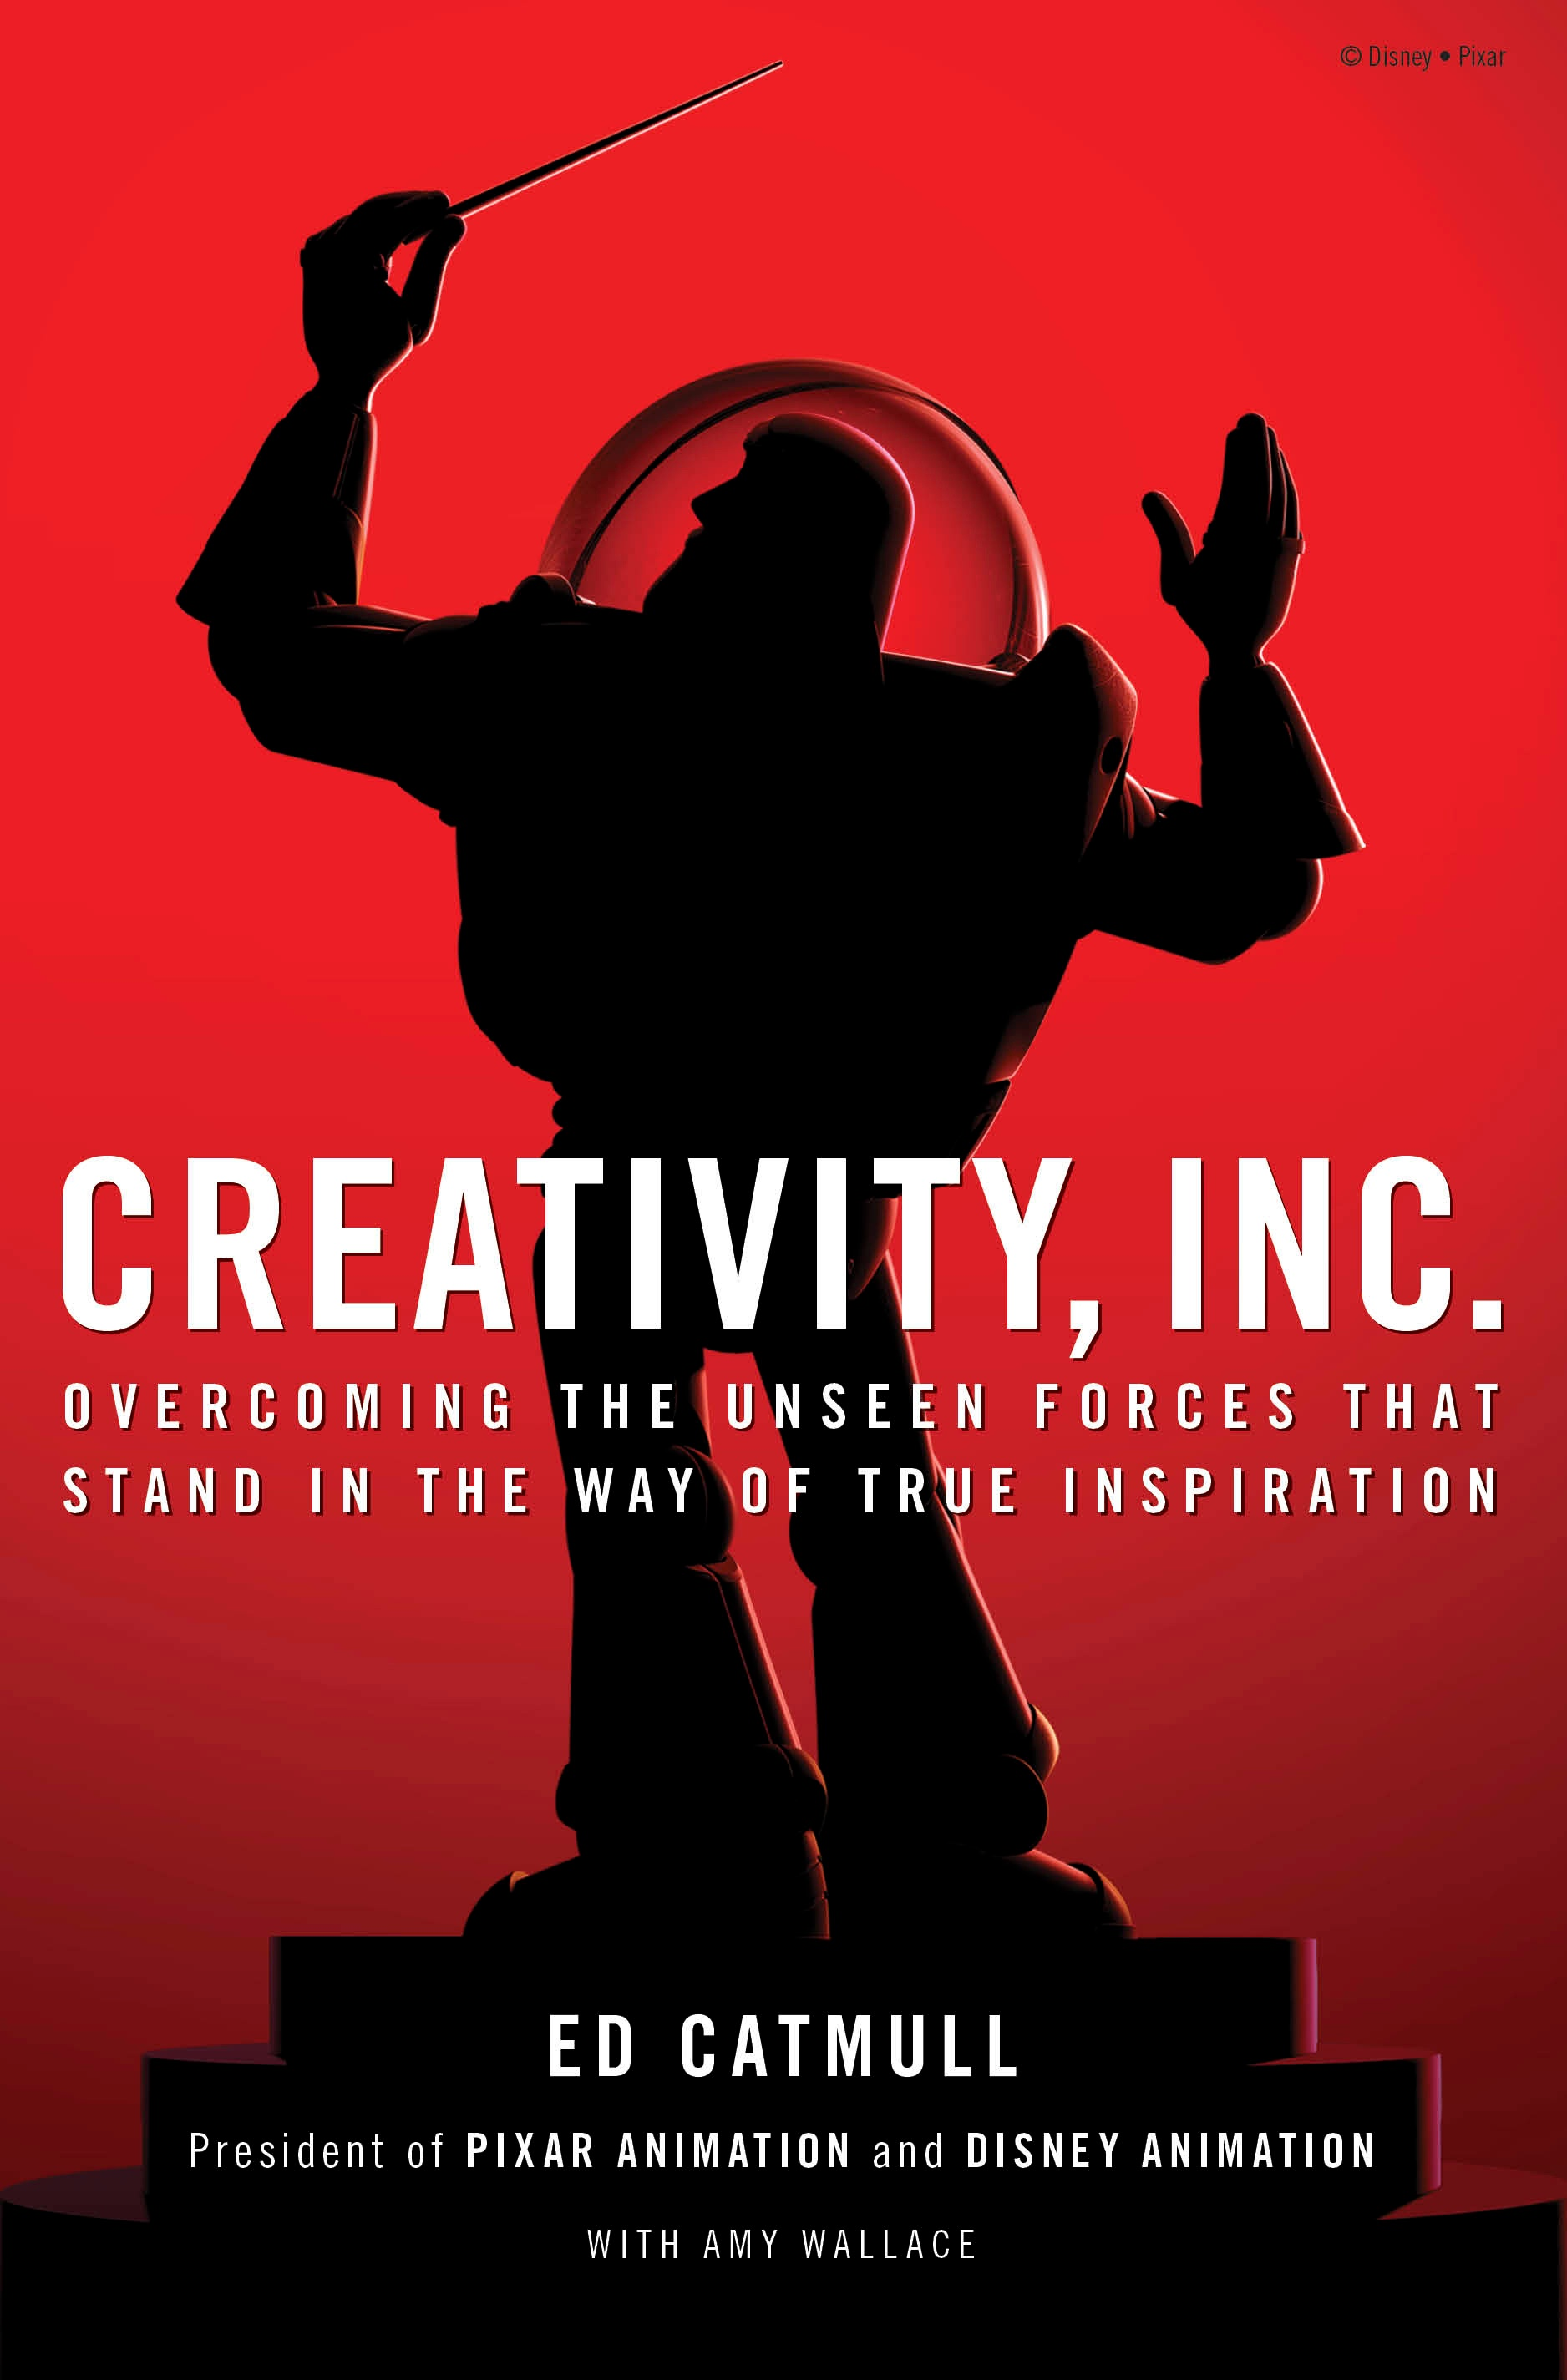 Creativity-Inc-by-Ed-Catmull.jpg  9 Marketing Books to Read Before Q1 Ends Creativity Inc by Ed Catmull